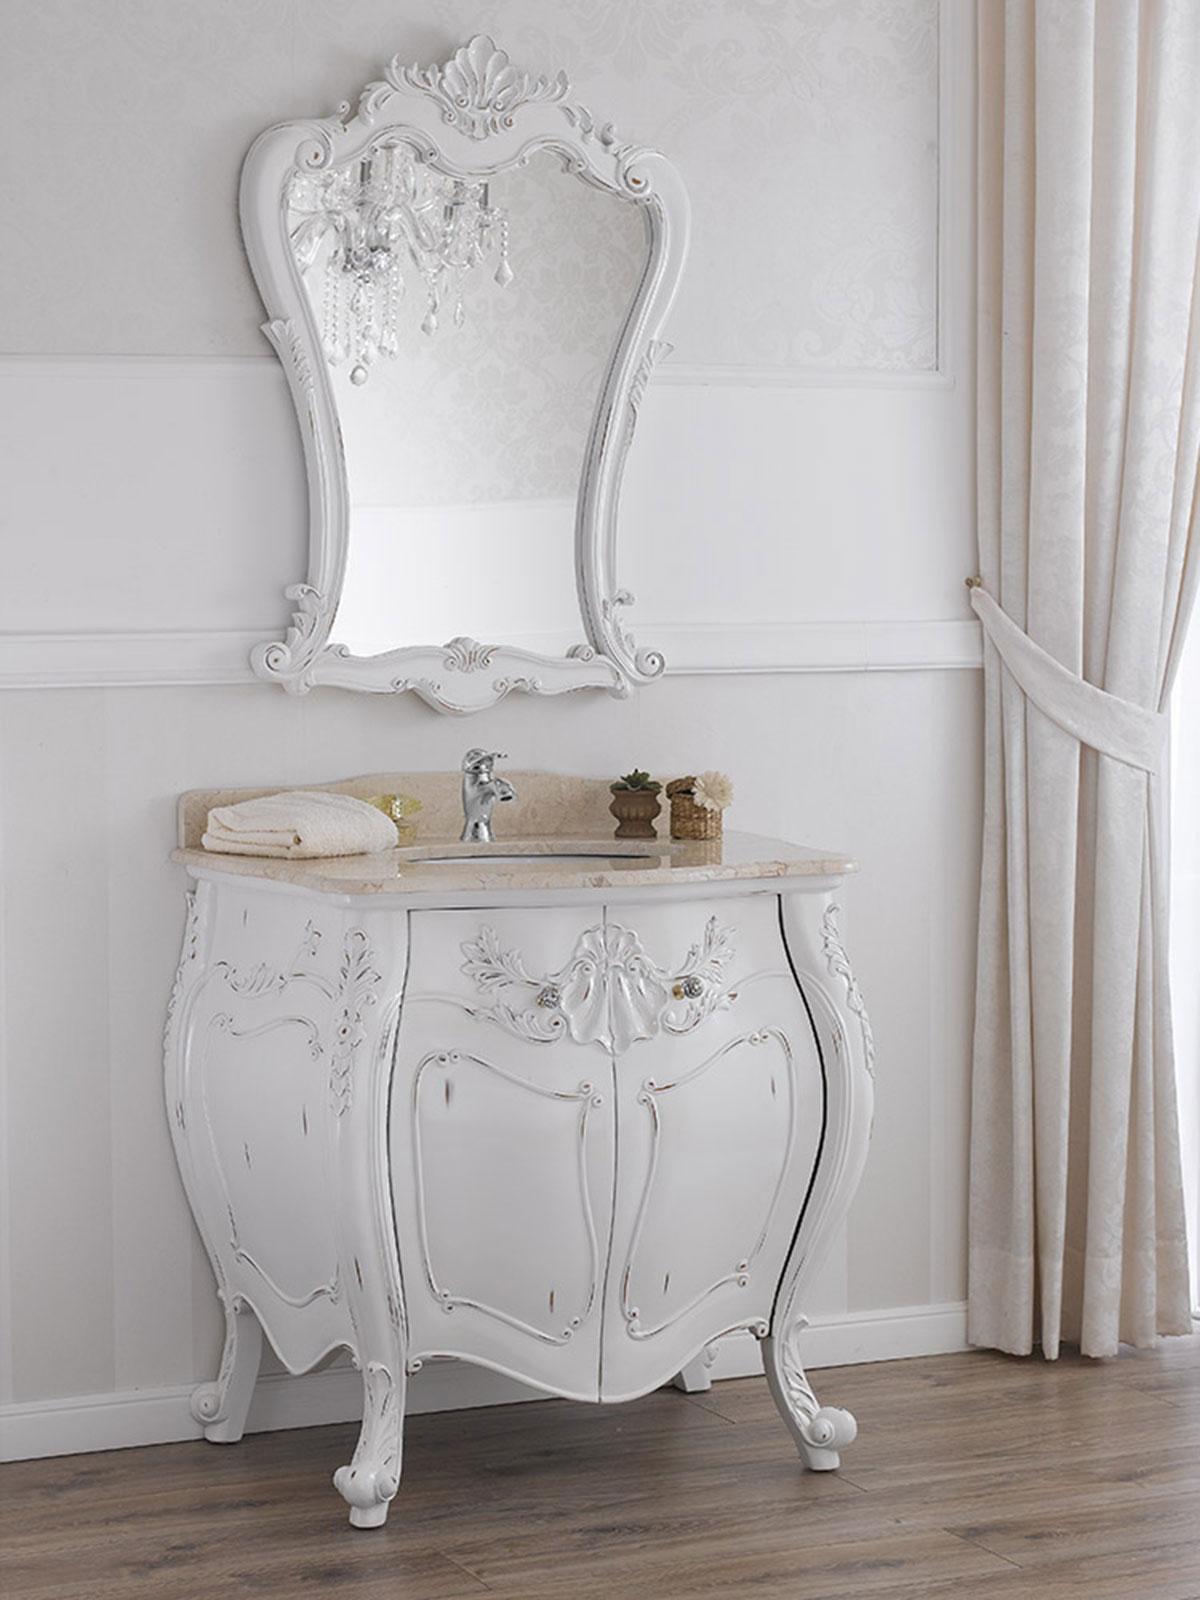 Bathroom Vanity Unit Anderson Shabby Chic Style Antique White Marble Cream Knobs Ebay